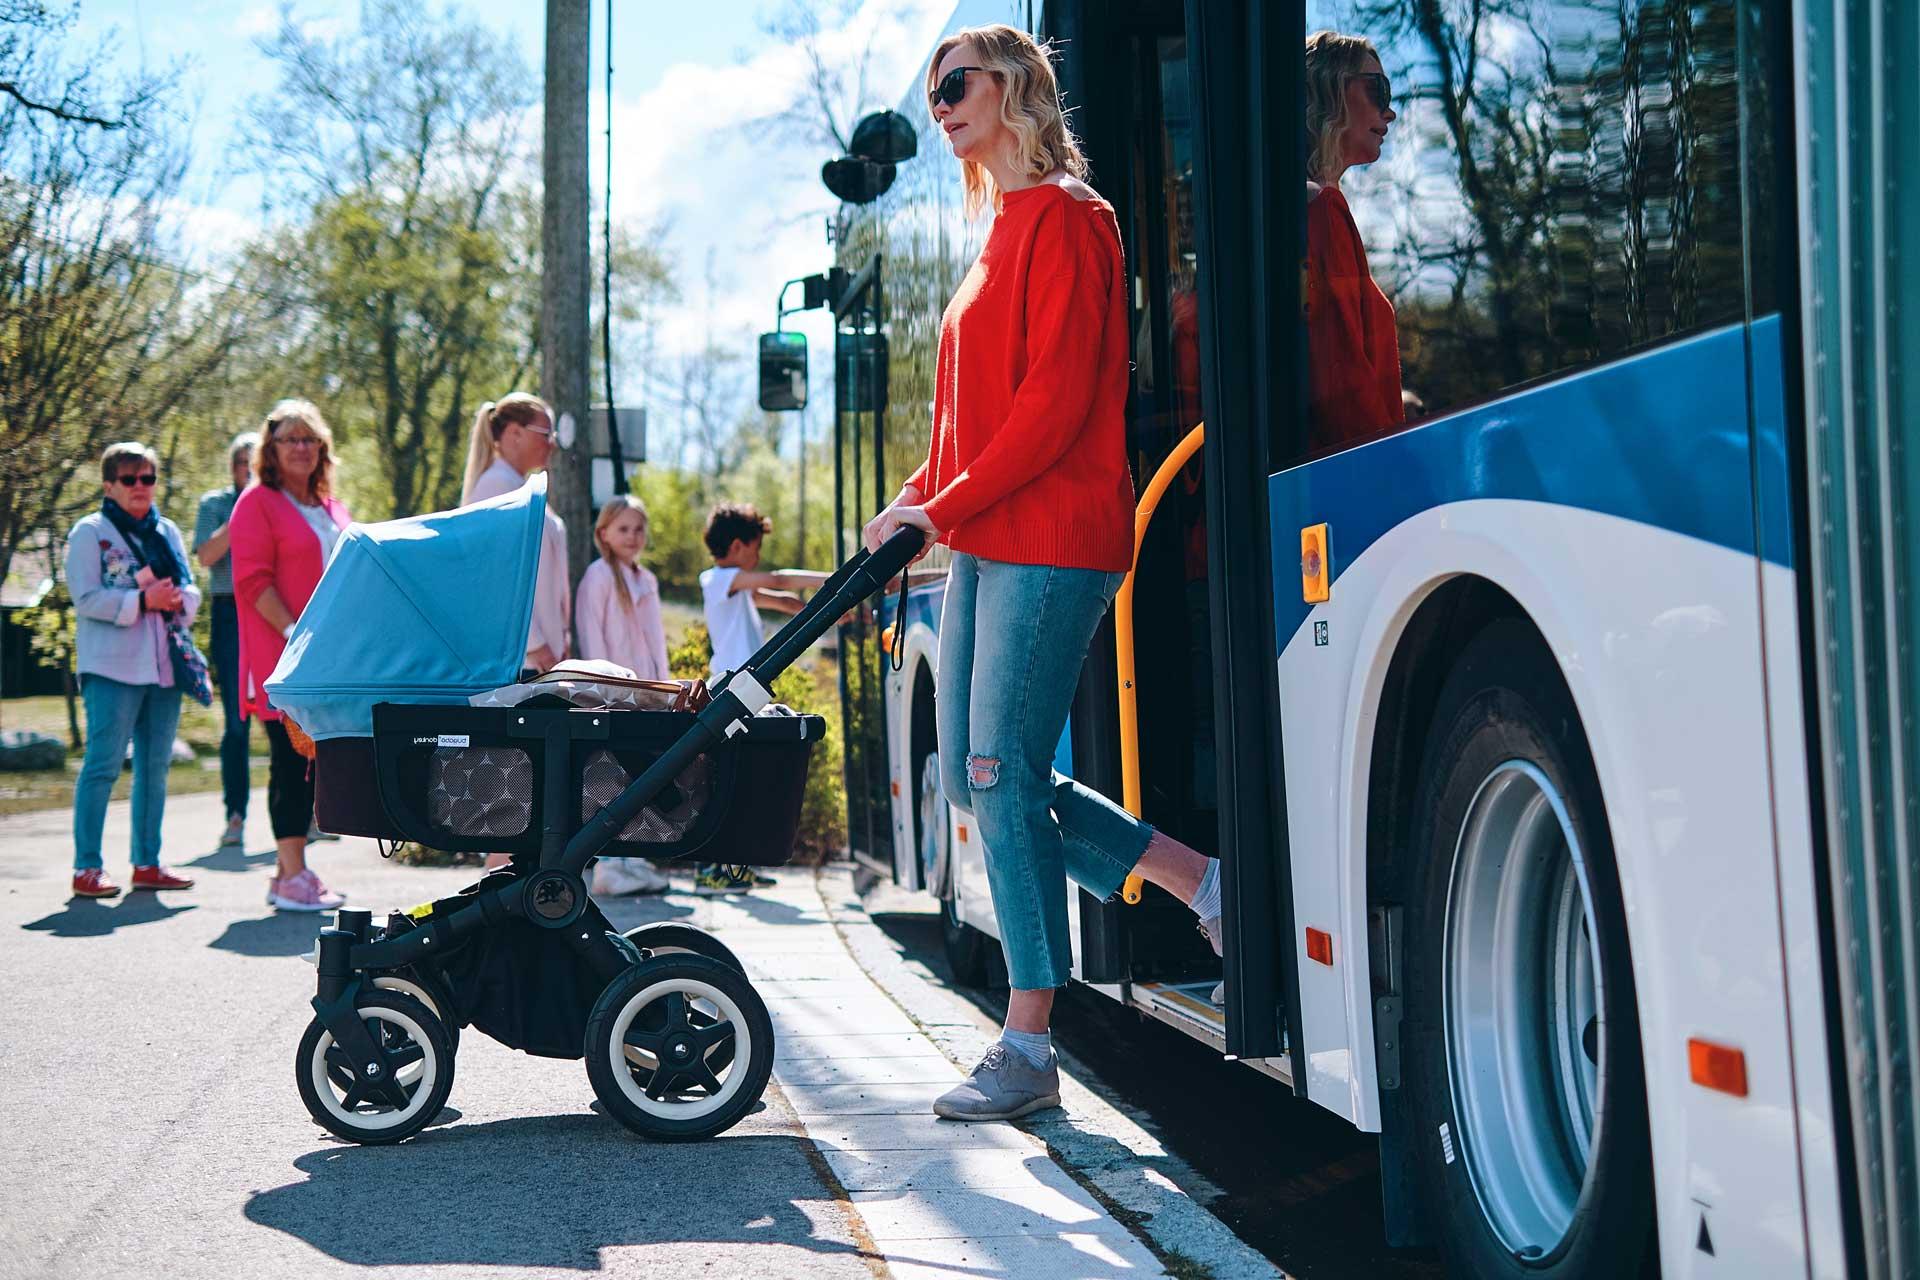 Bussresenär med barnvagn kliver av VL buss. Fotograf: Pressbild Adam af Ekenstam